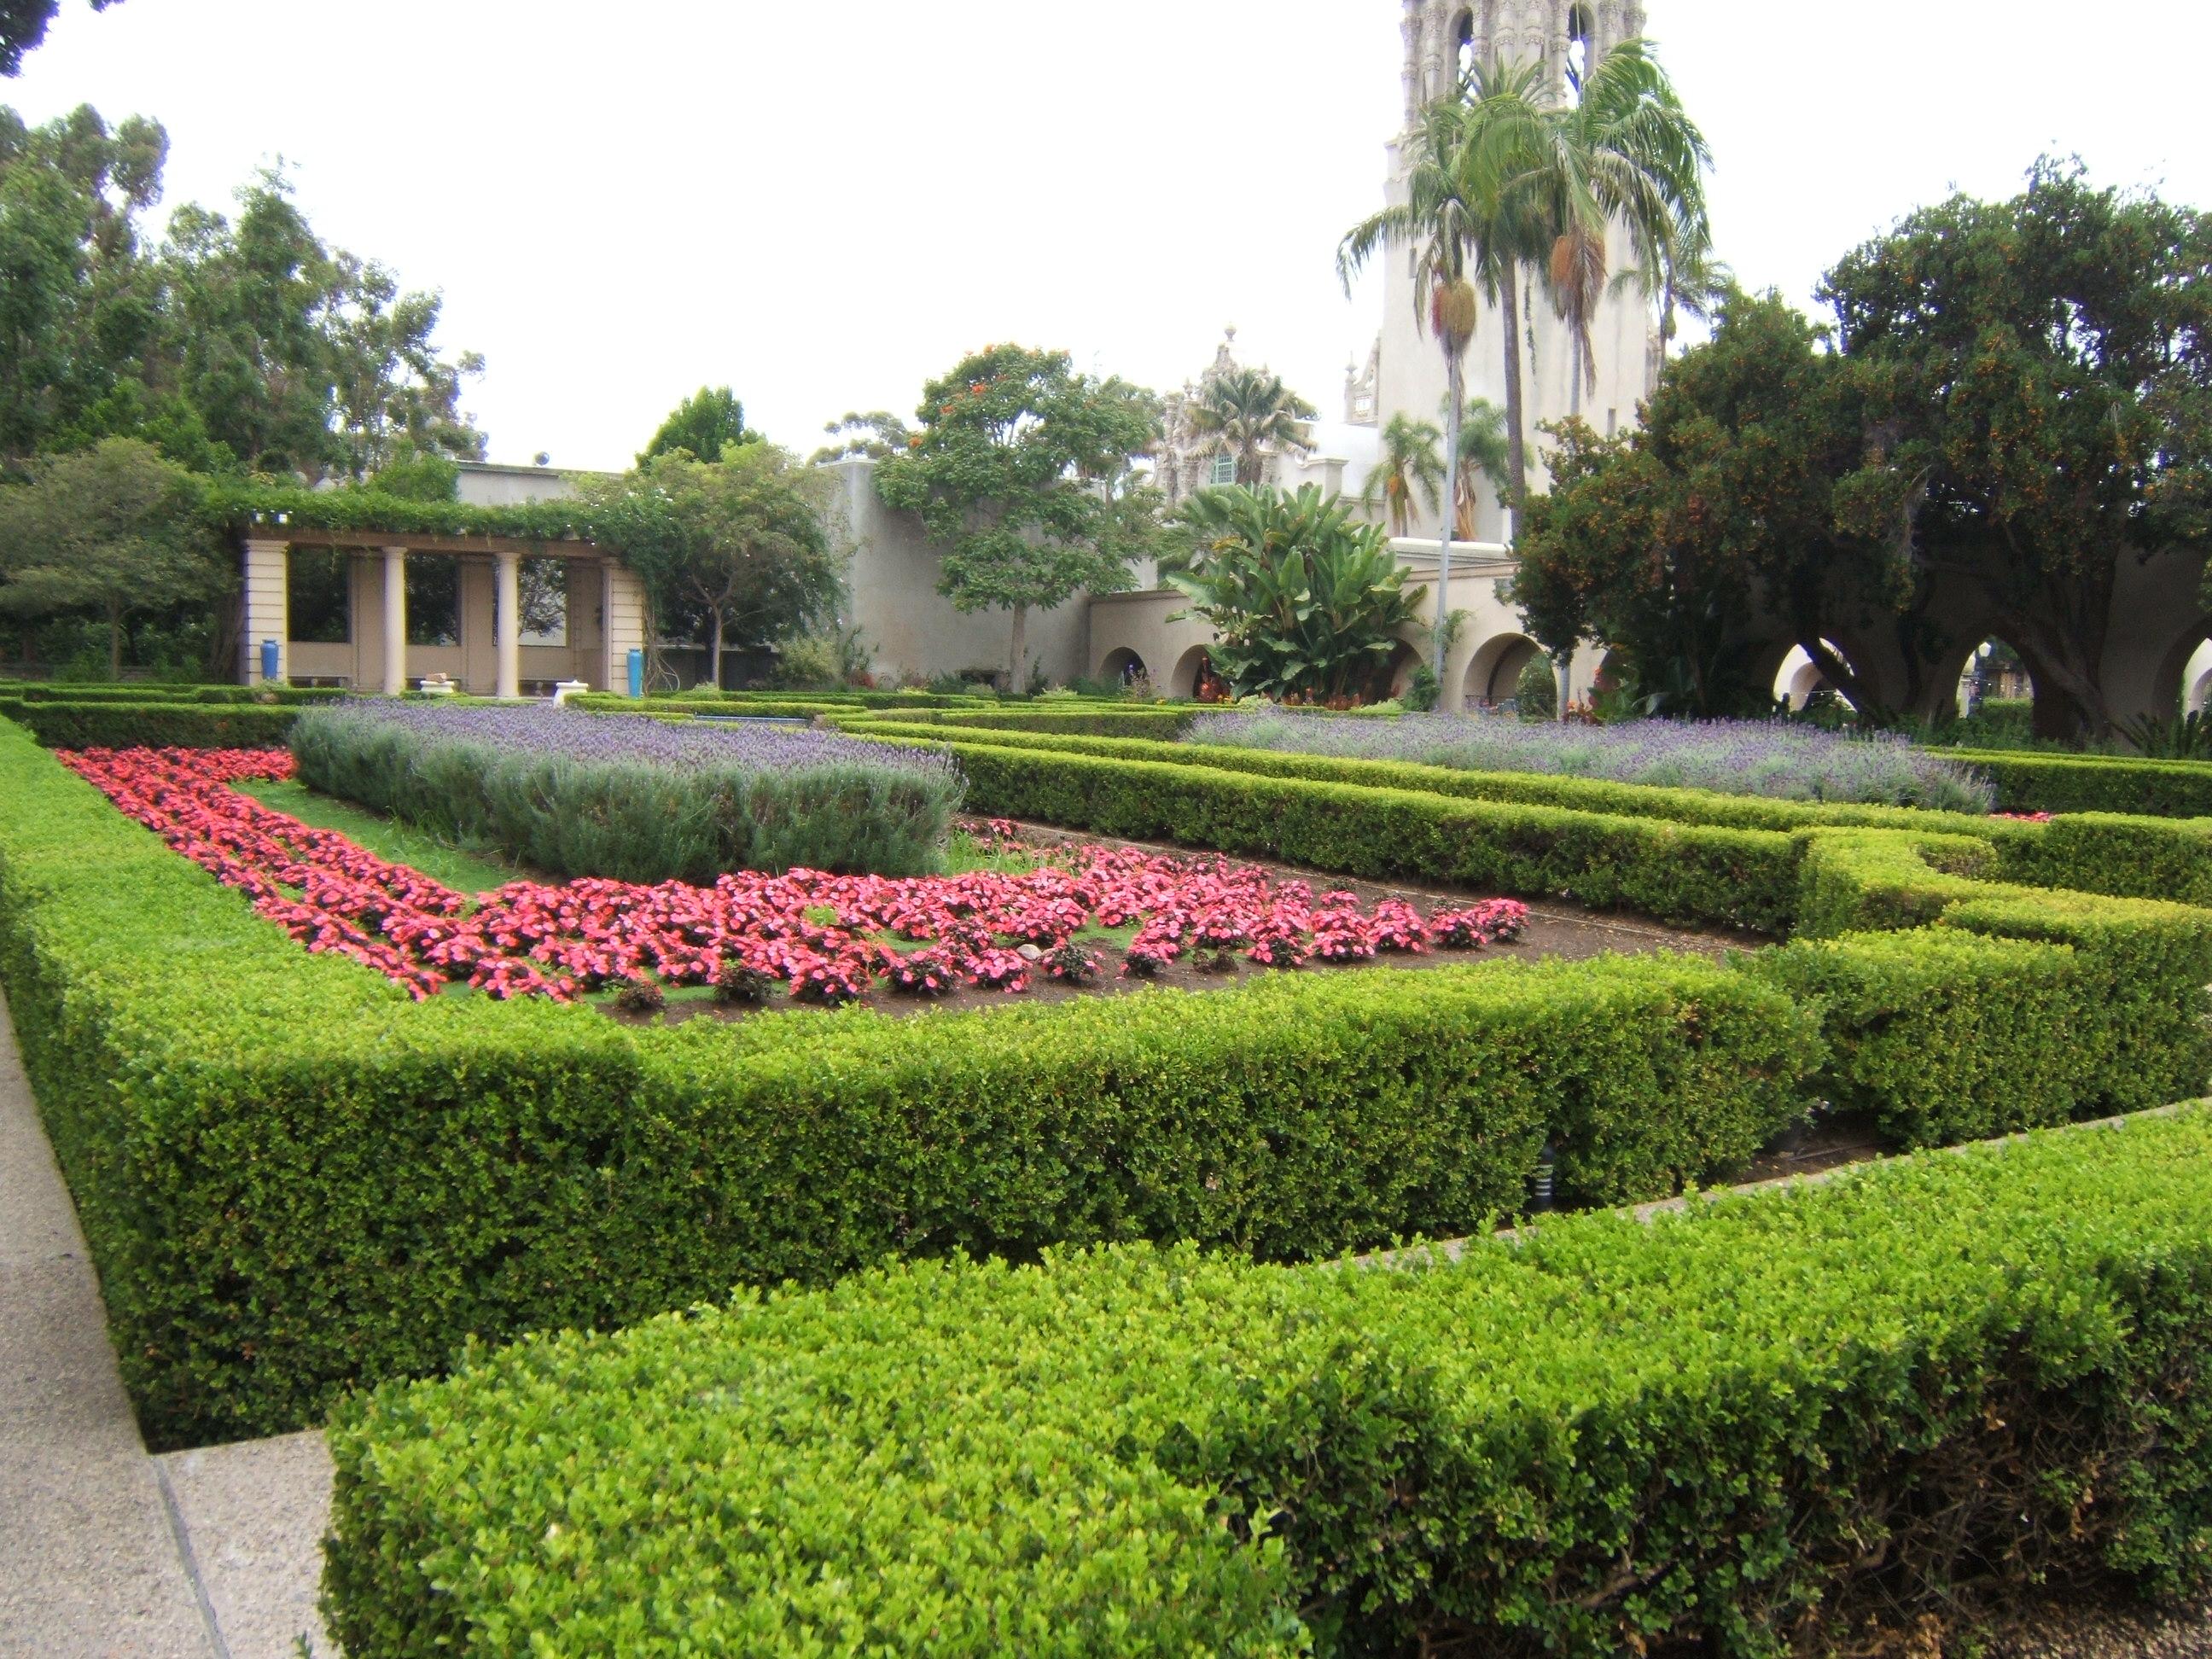 The gardens of Balboa Park  The Lucky One